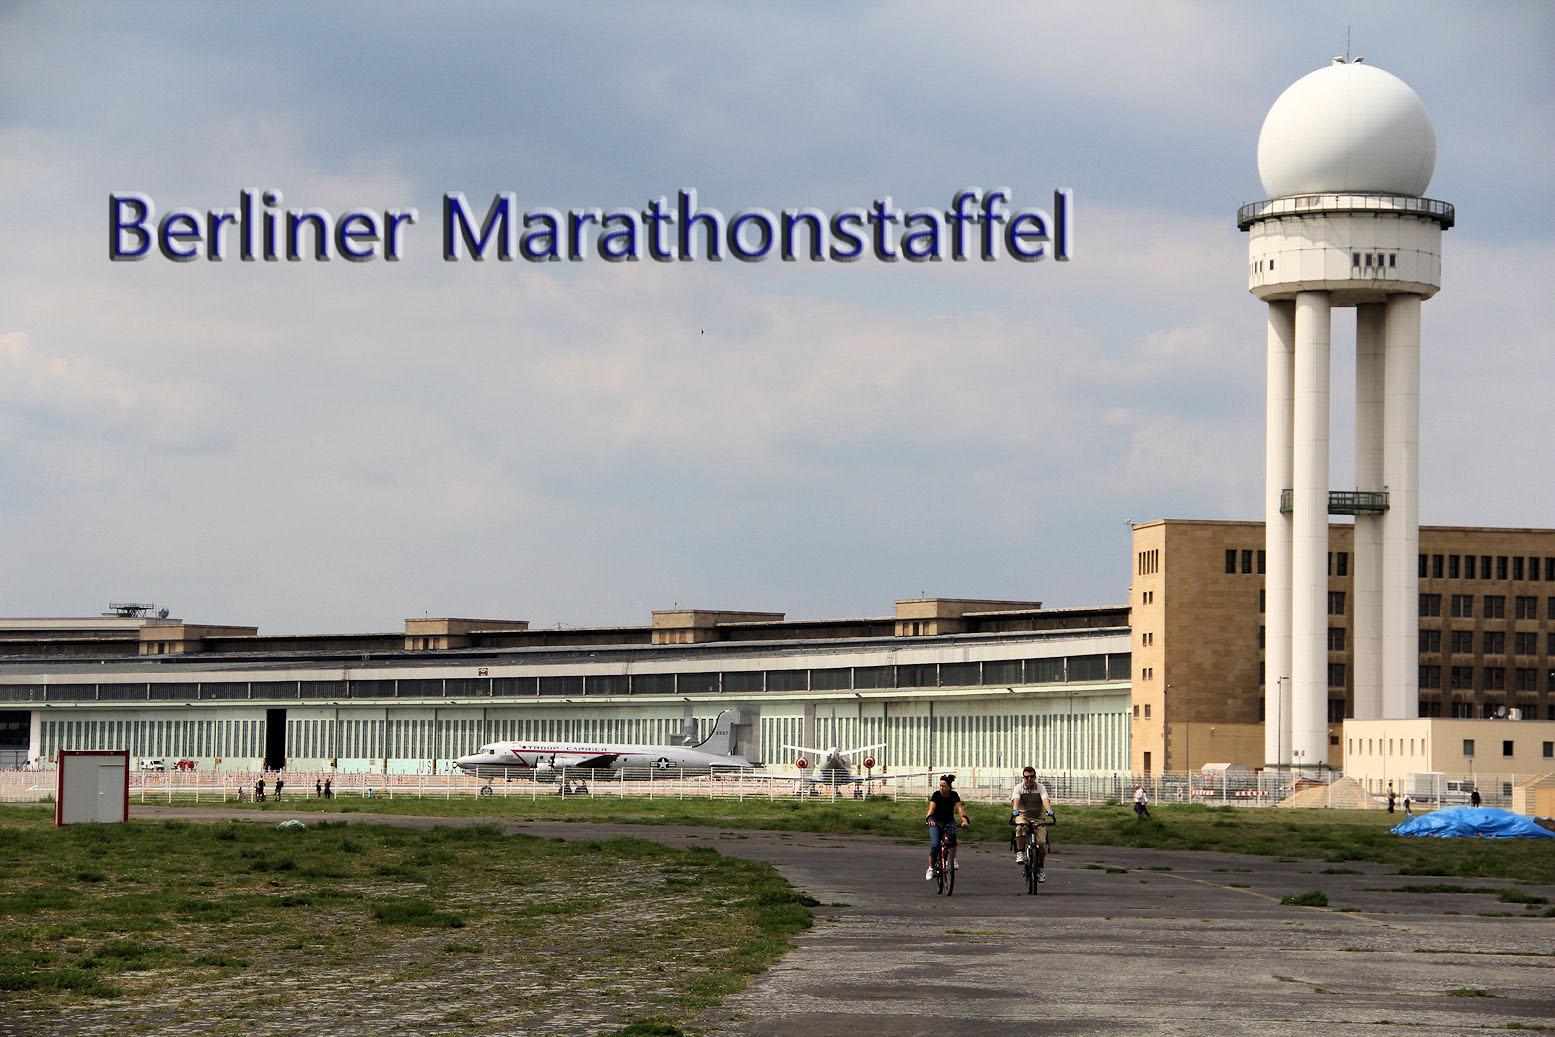 marathonstaffel